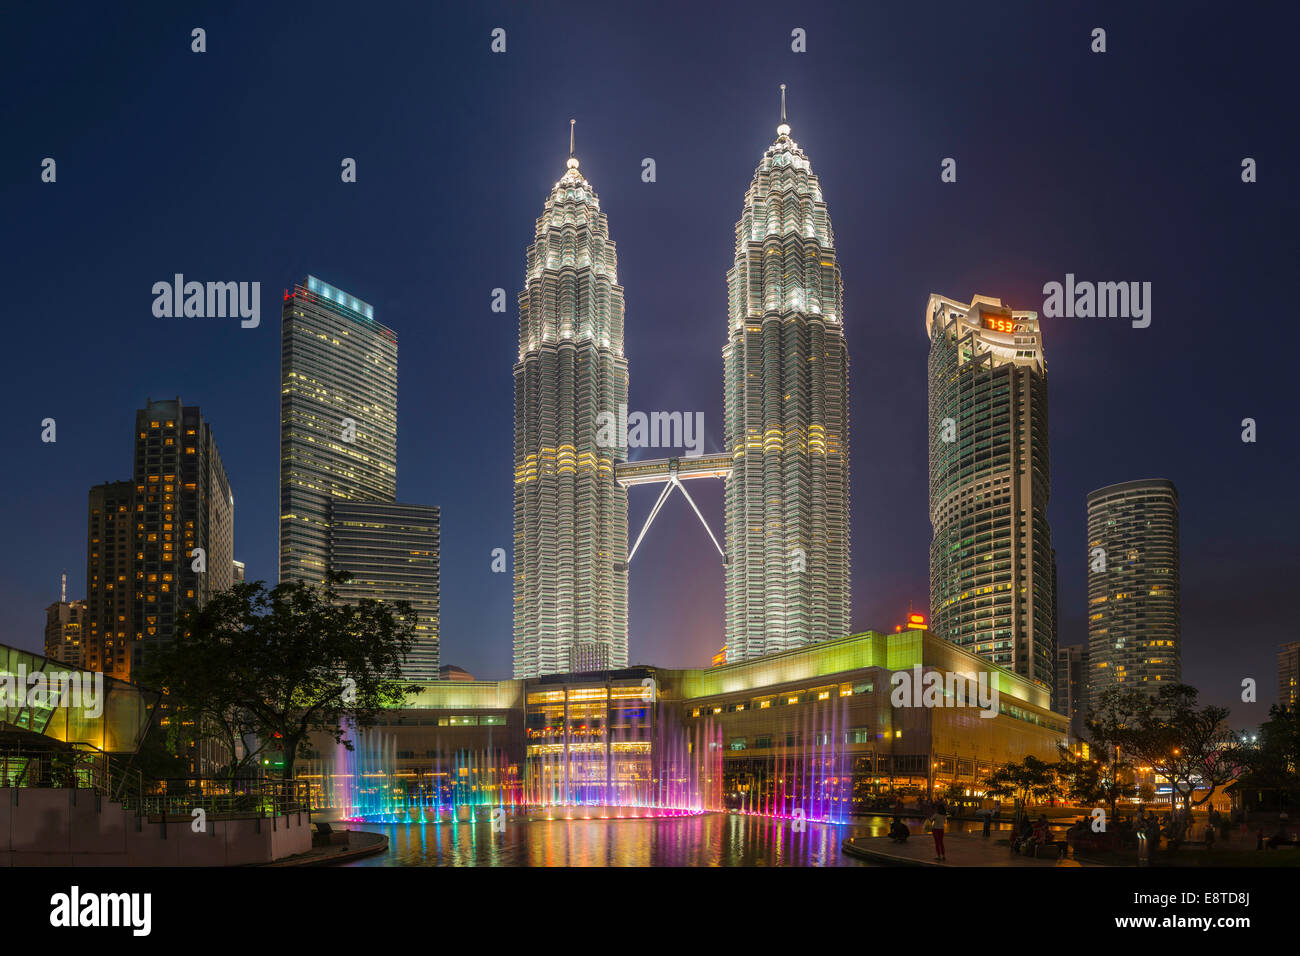 Rascacielos iluminados en el horizonte de la ciudad de Kuala Lumpur, Kuala Lumpur, Malasia Imagen De Stock